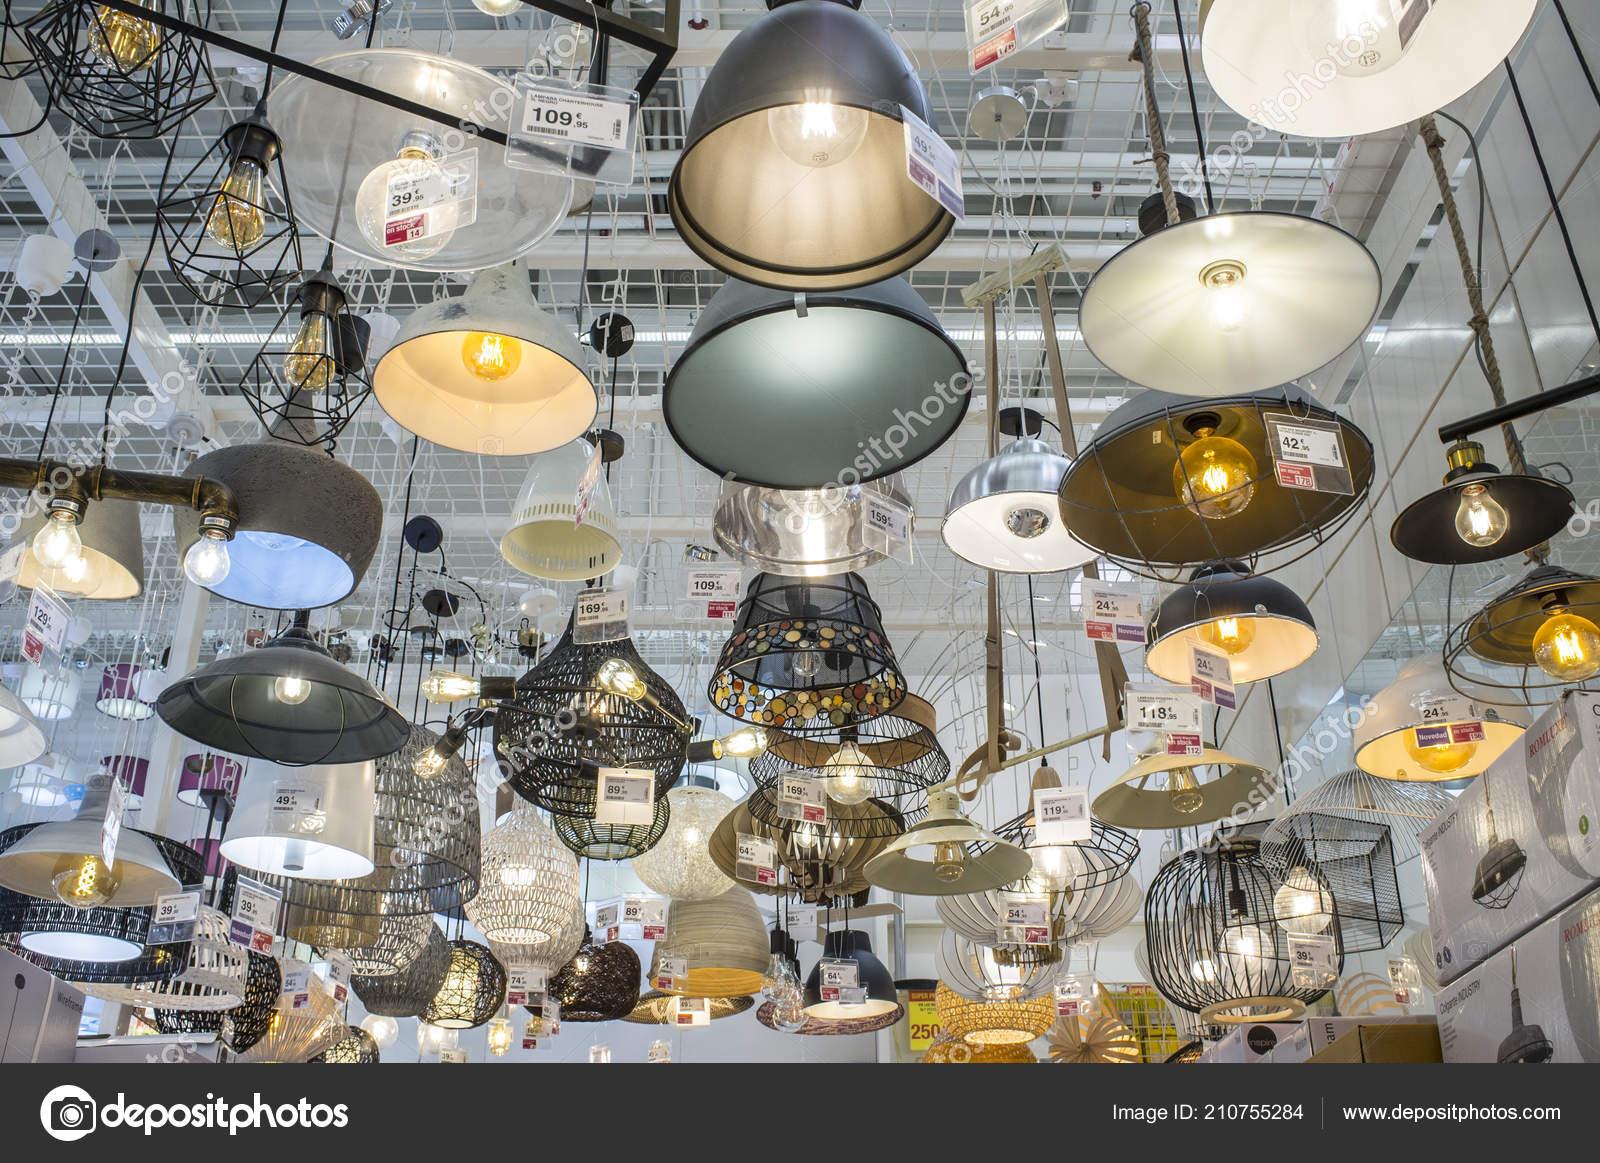 бадахос испания мая 2018 большой центр леруа мерлен магазин